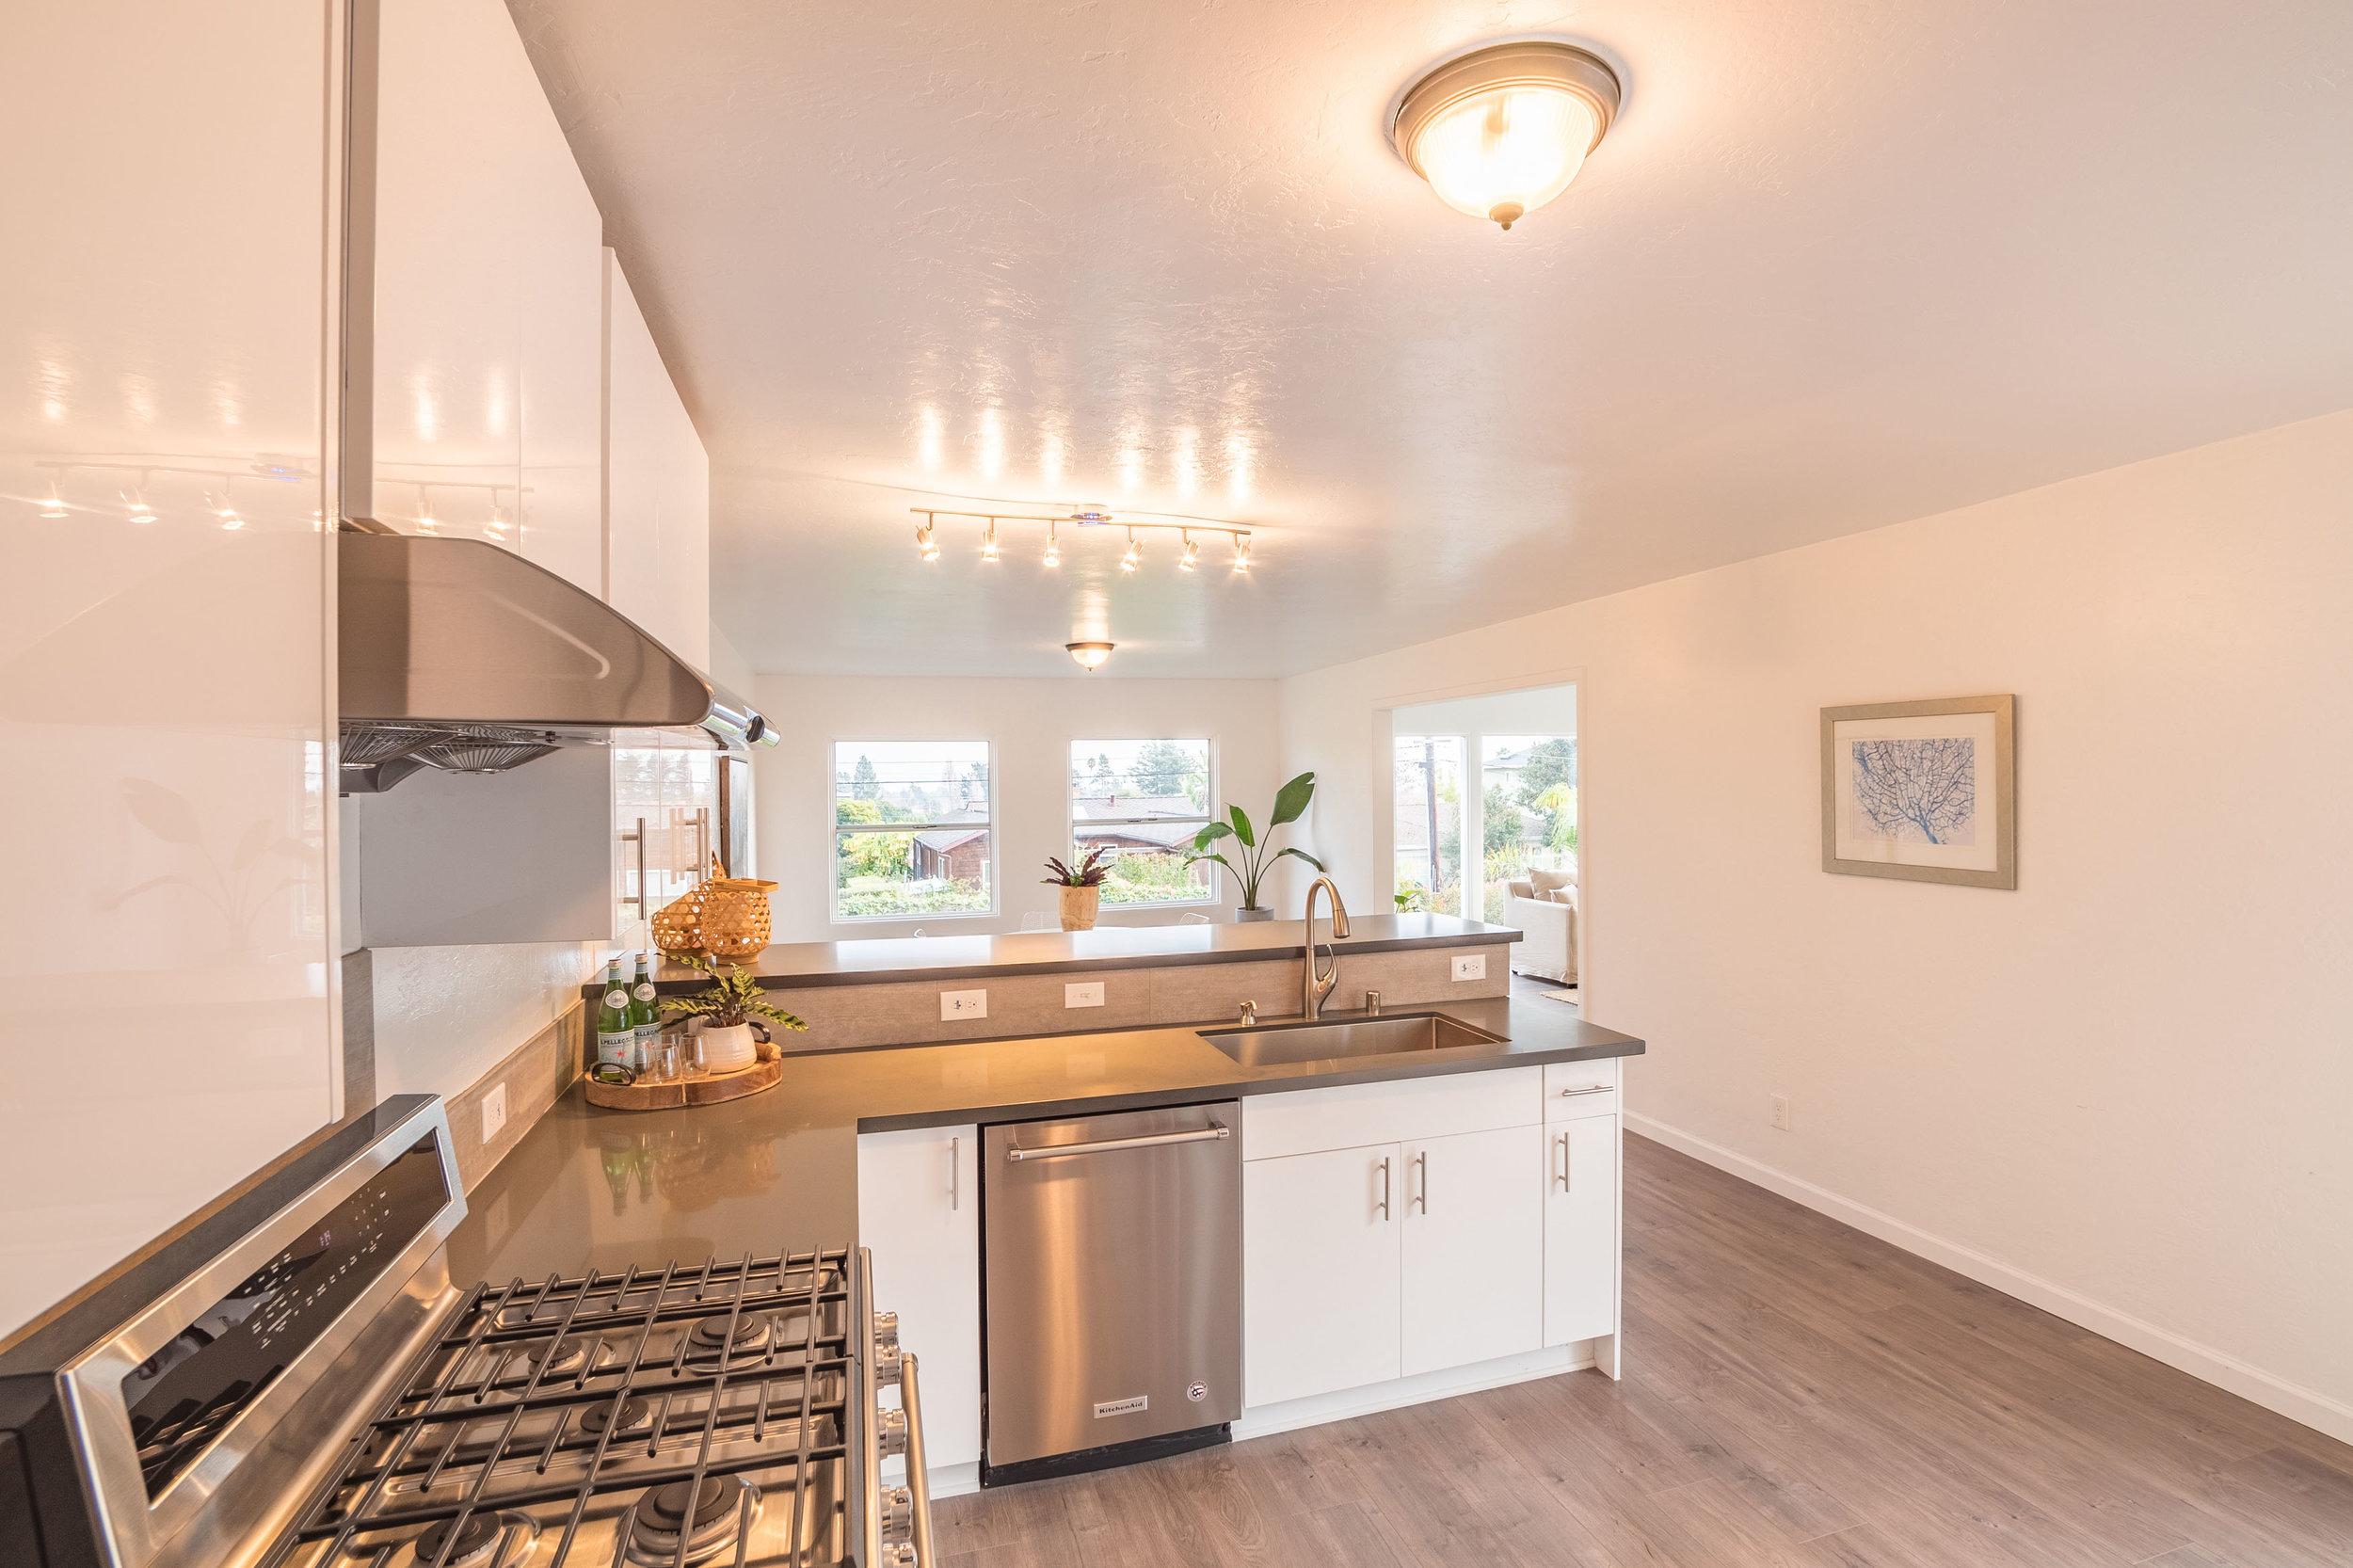 Santa Cruz Home with Remodeled Kitchen